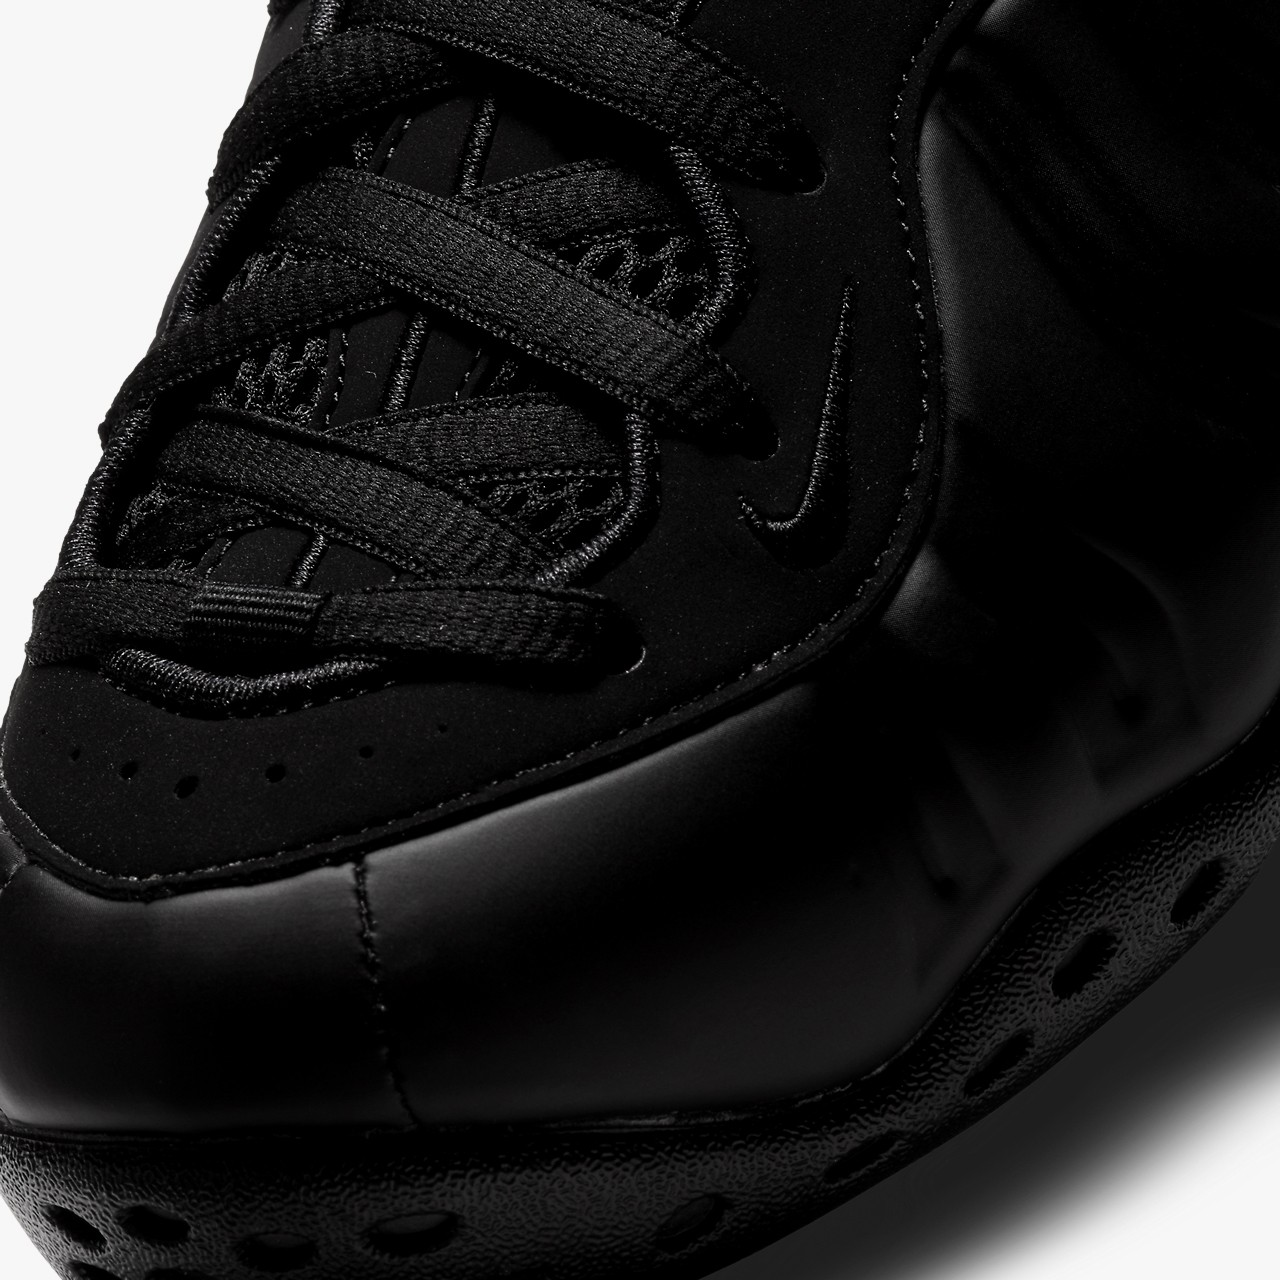 NIke Air Foamposite One Safari Hype Stew Sneakers Detroit